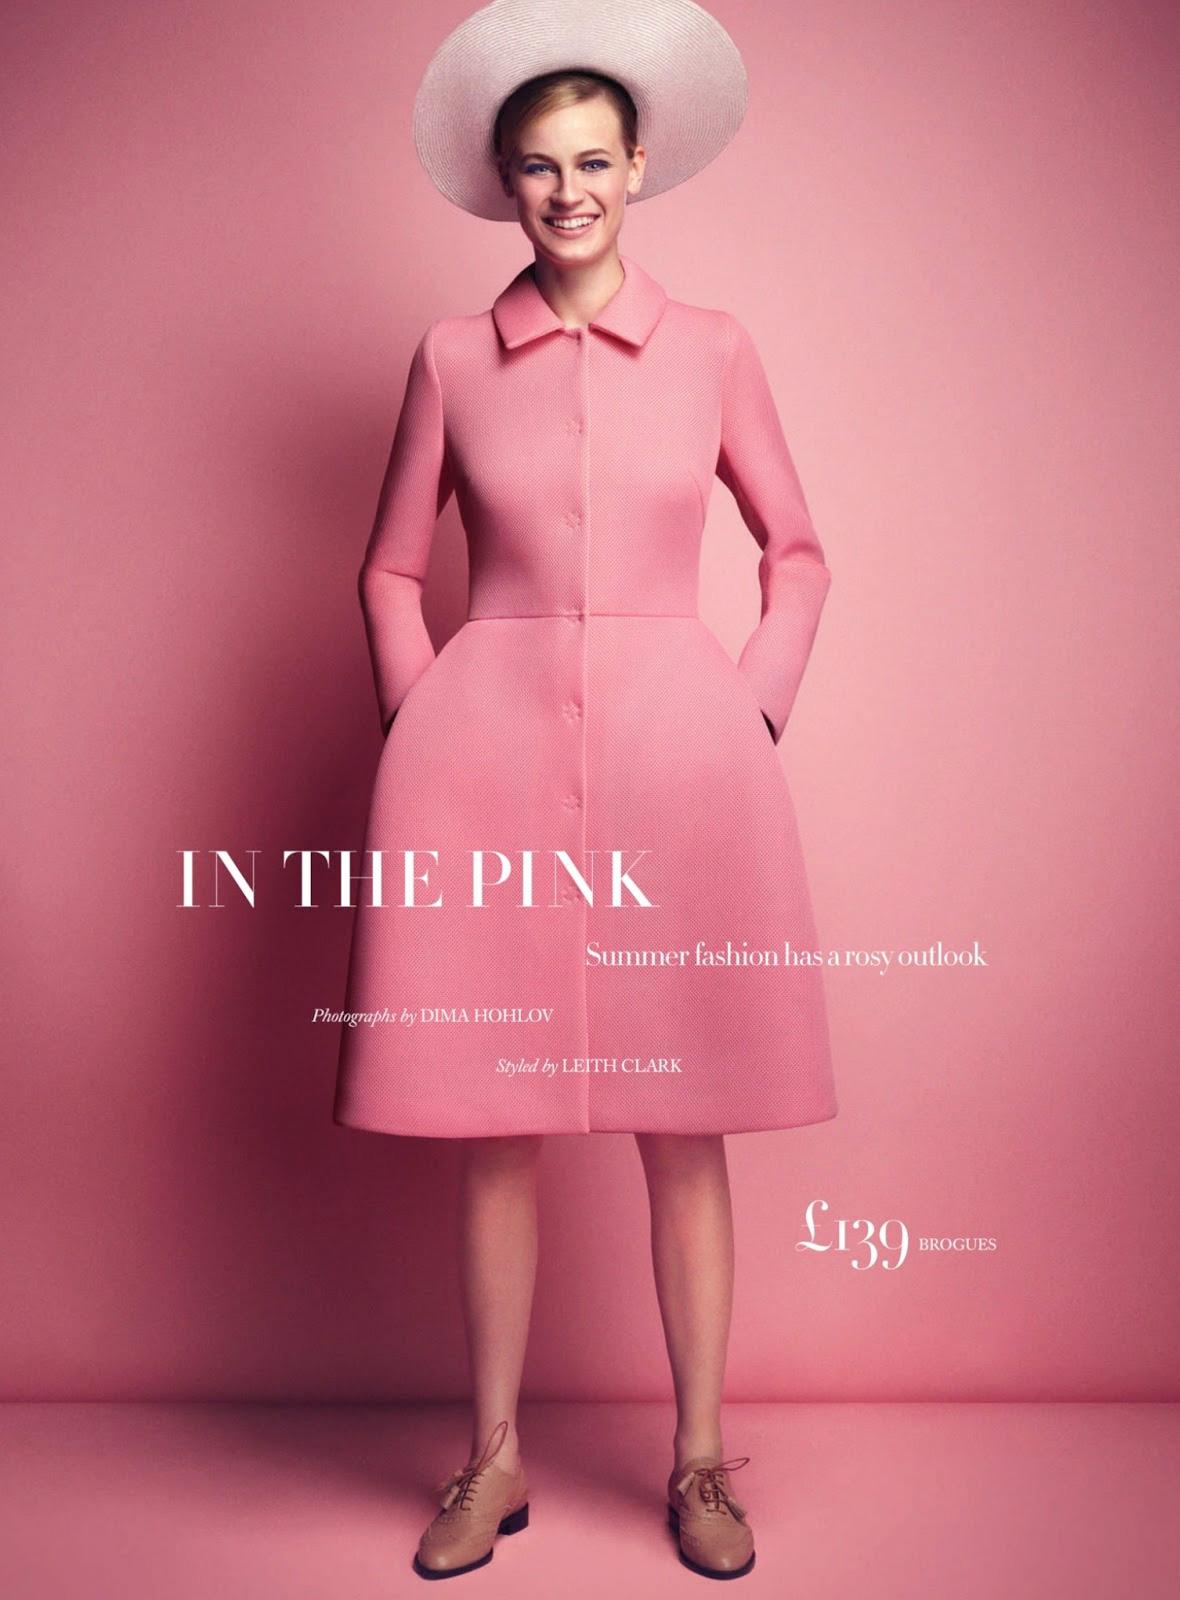 Pretty-in-pink-Paulina-Heiler-By-Dima-Hohlov-for-Uk-Harper's-Bazaar